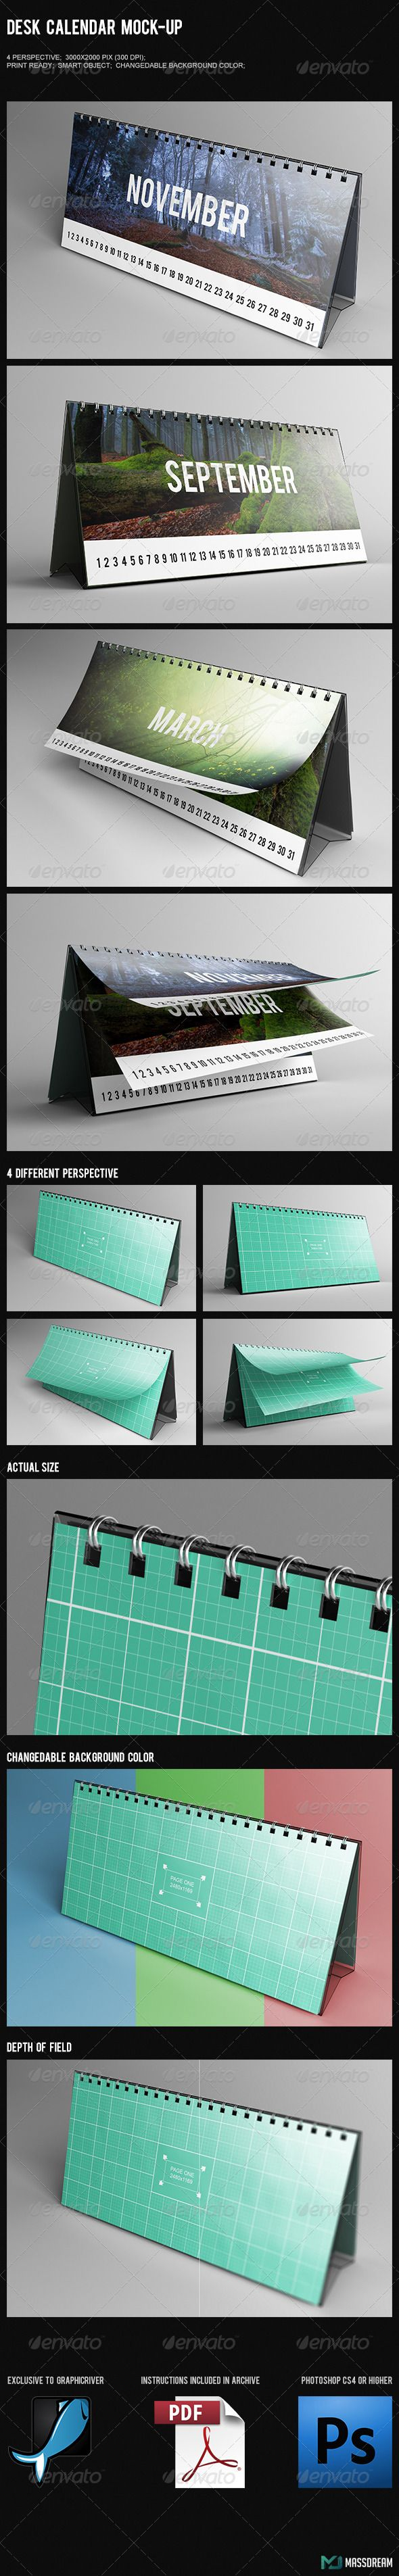 Desk Calendar Mock-Up - Product Mock-Ups Graphics